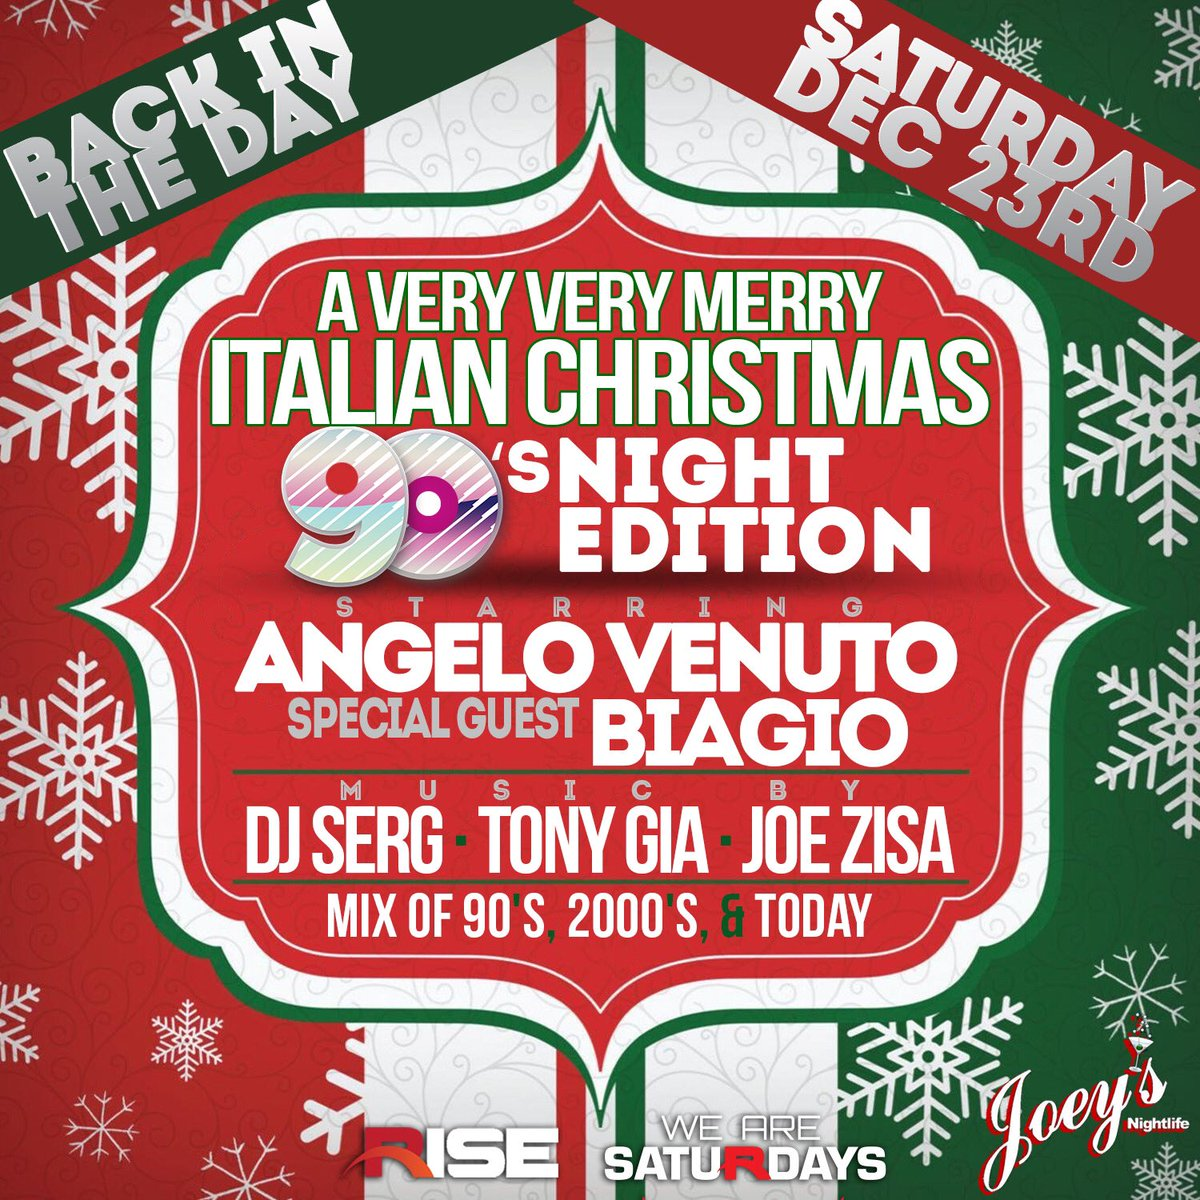 Italian Christmas Music.Joey Barcellona On Twitter Tonight Italian Christmas